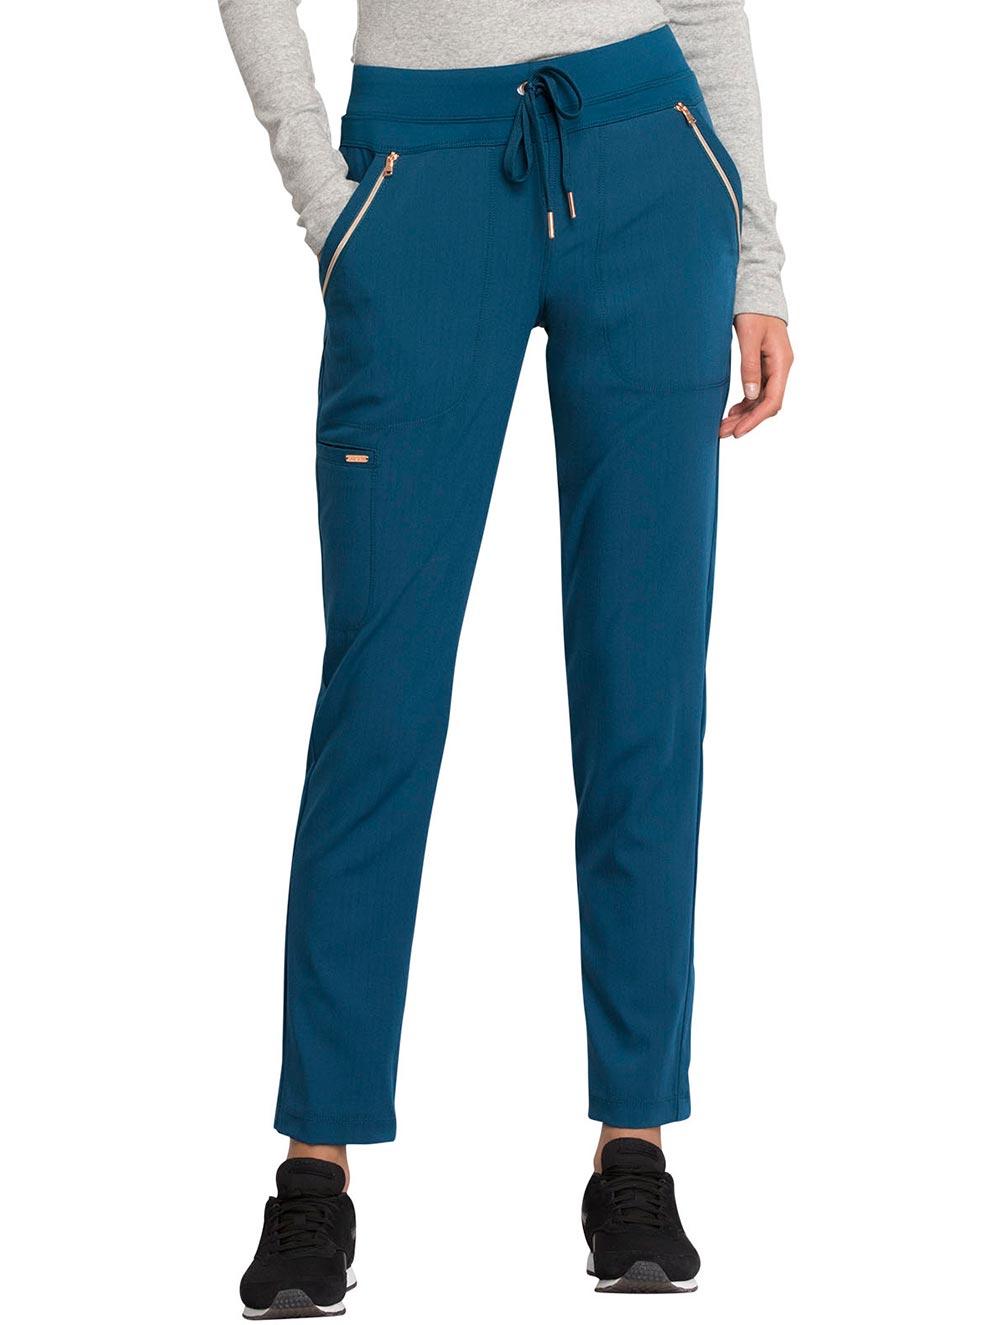 Mid Rise Straight Leg Drawstring Pants